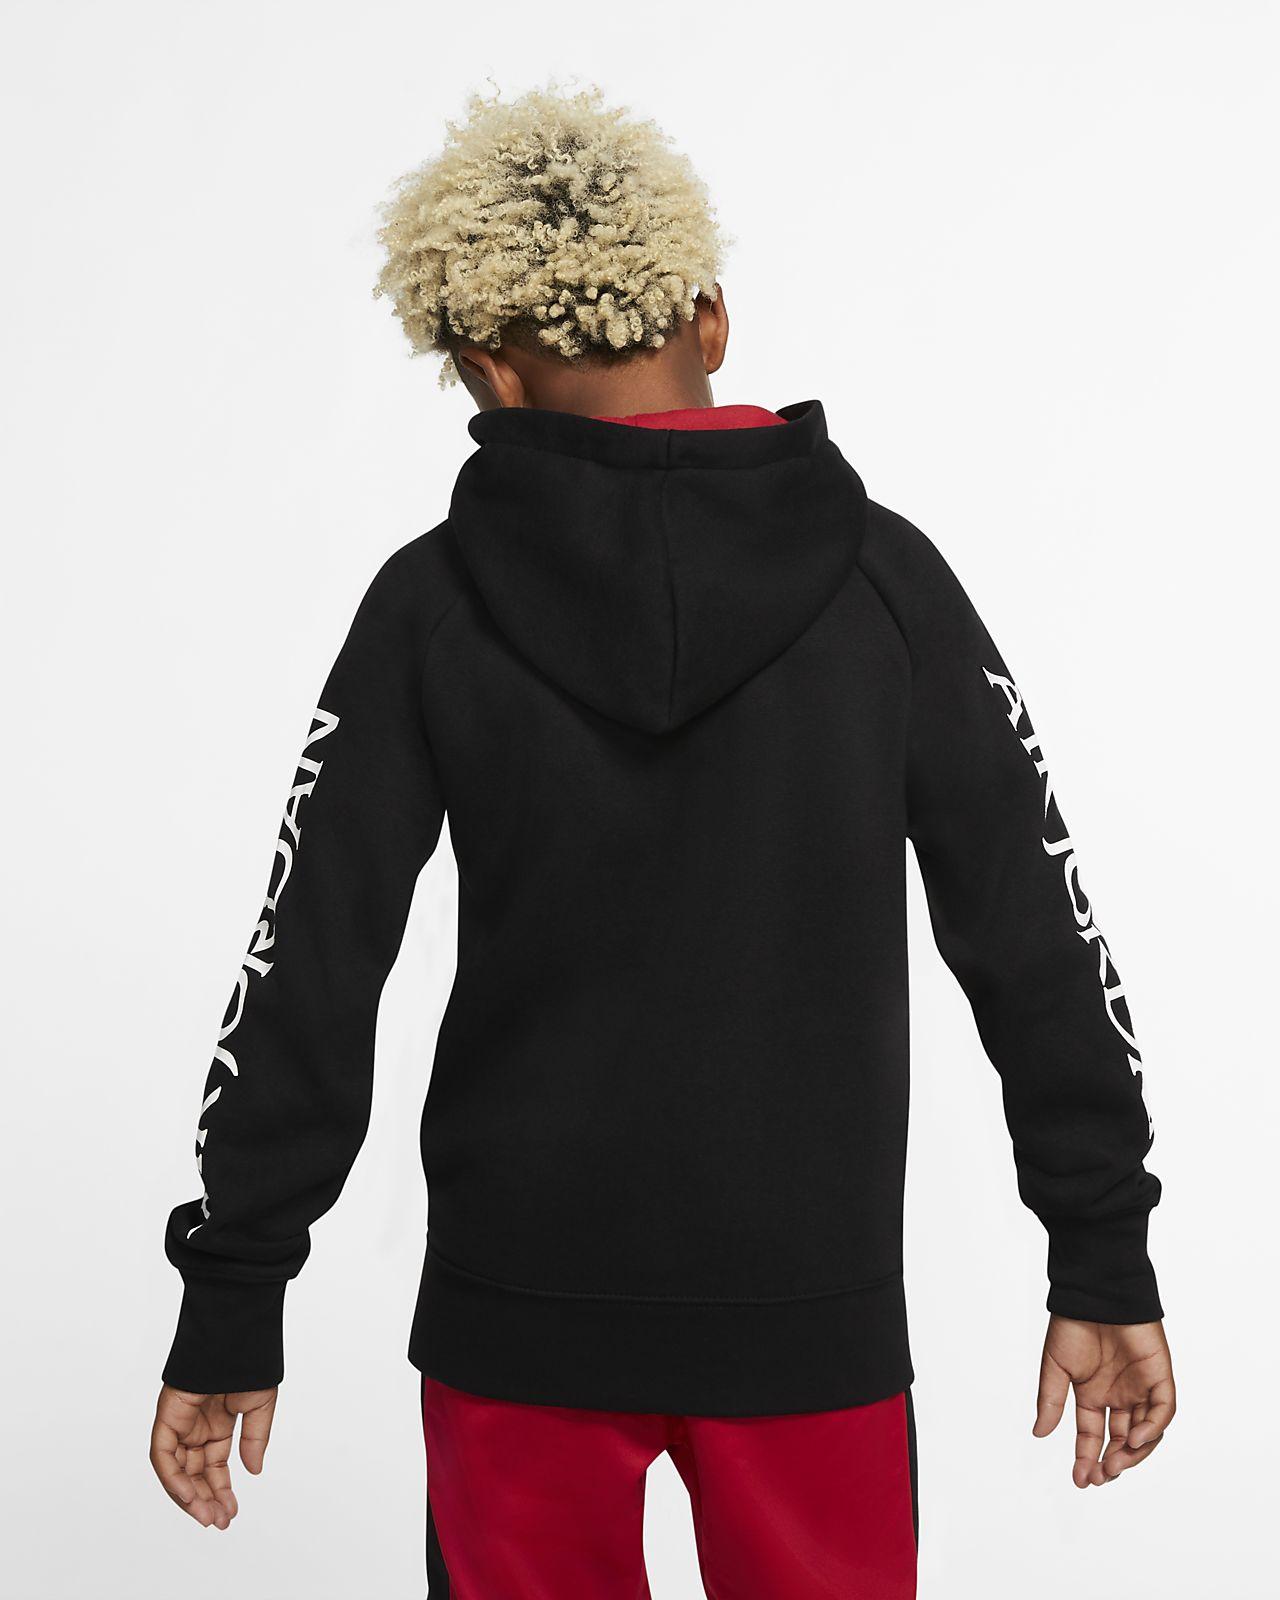 Boys Nike Hoodies & Sweatshirts Kids Tops, Clothing | Kohl's